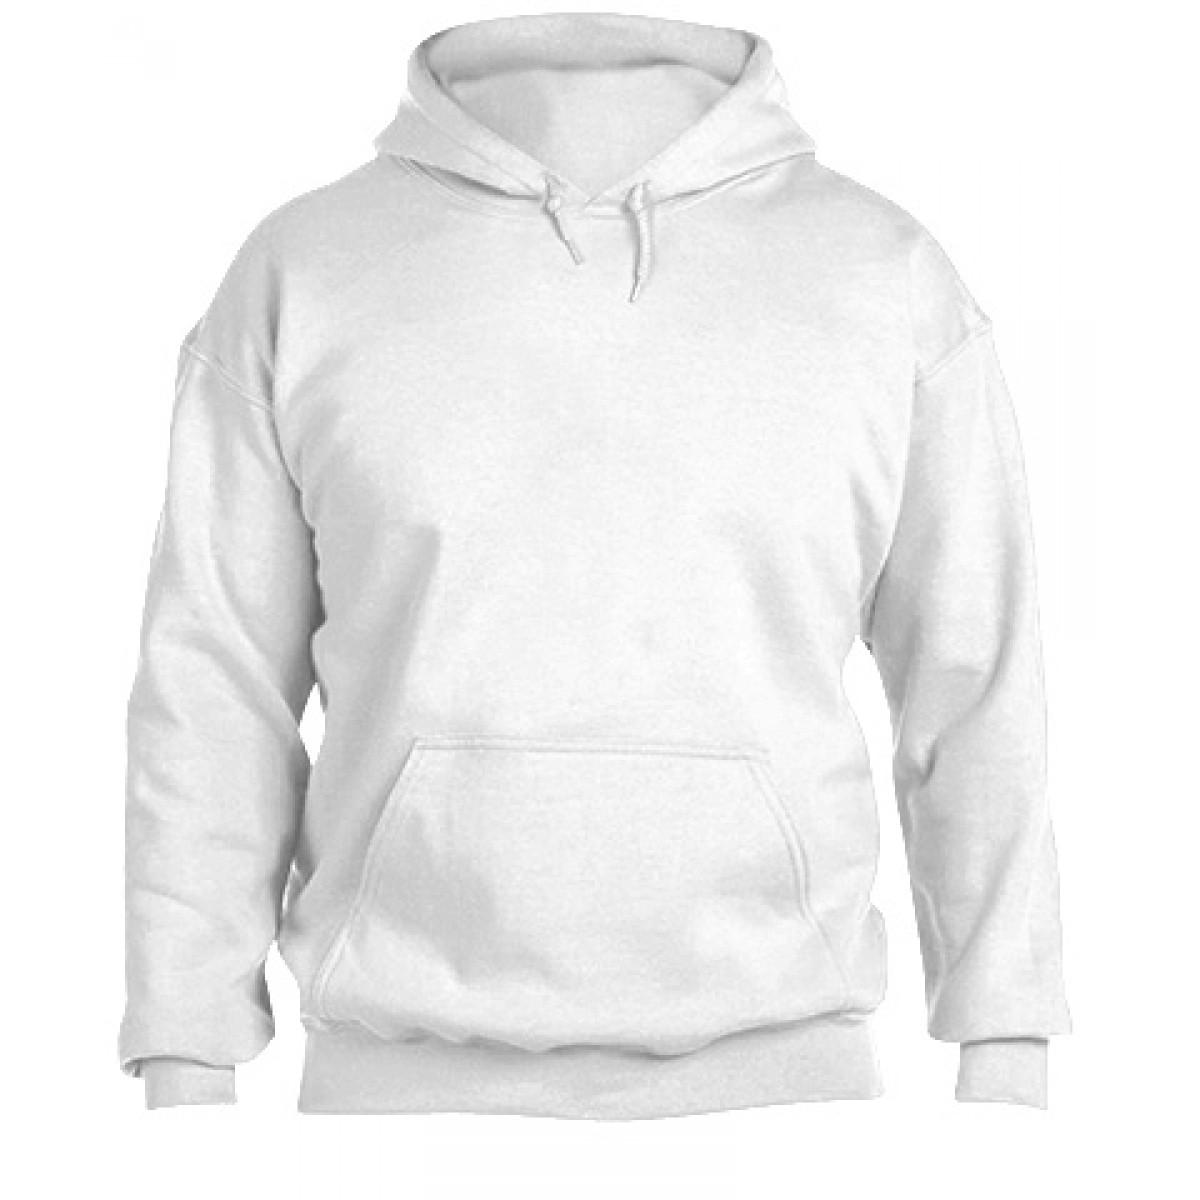 Solid Hooded Sweatshirt  50/50 Heavy Blend